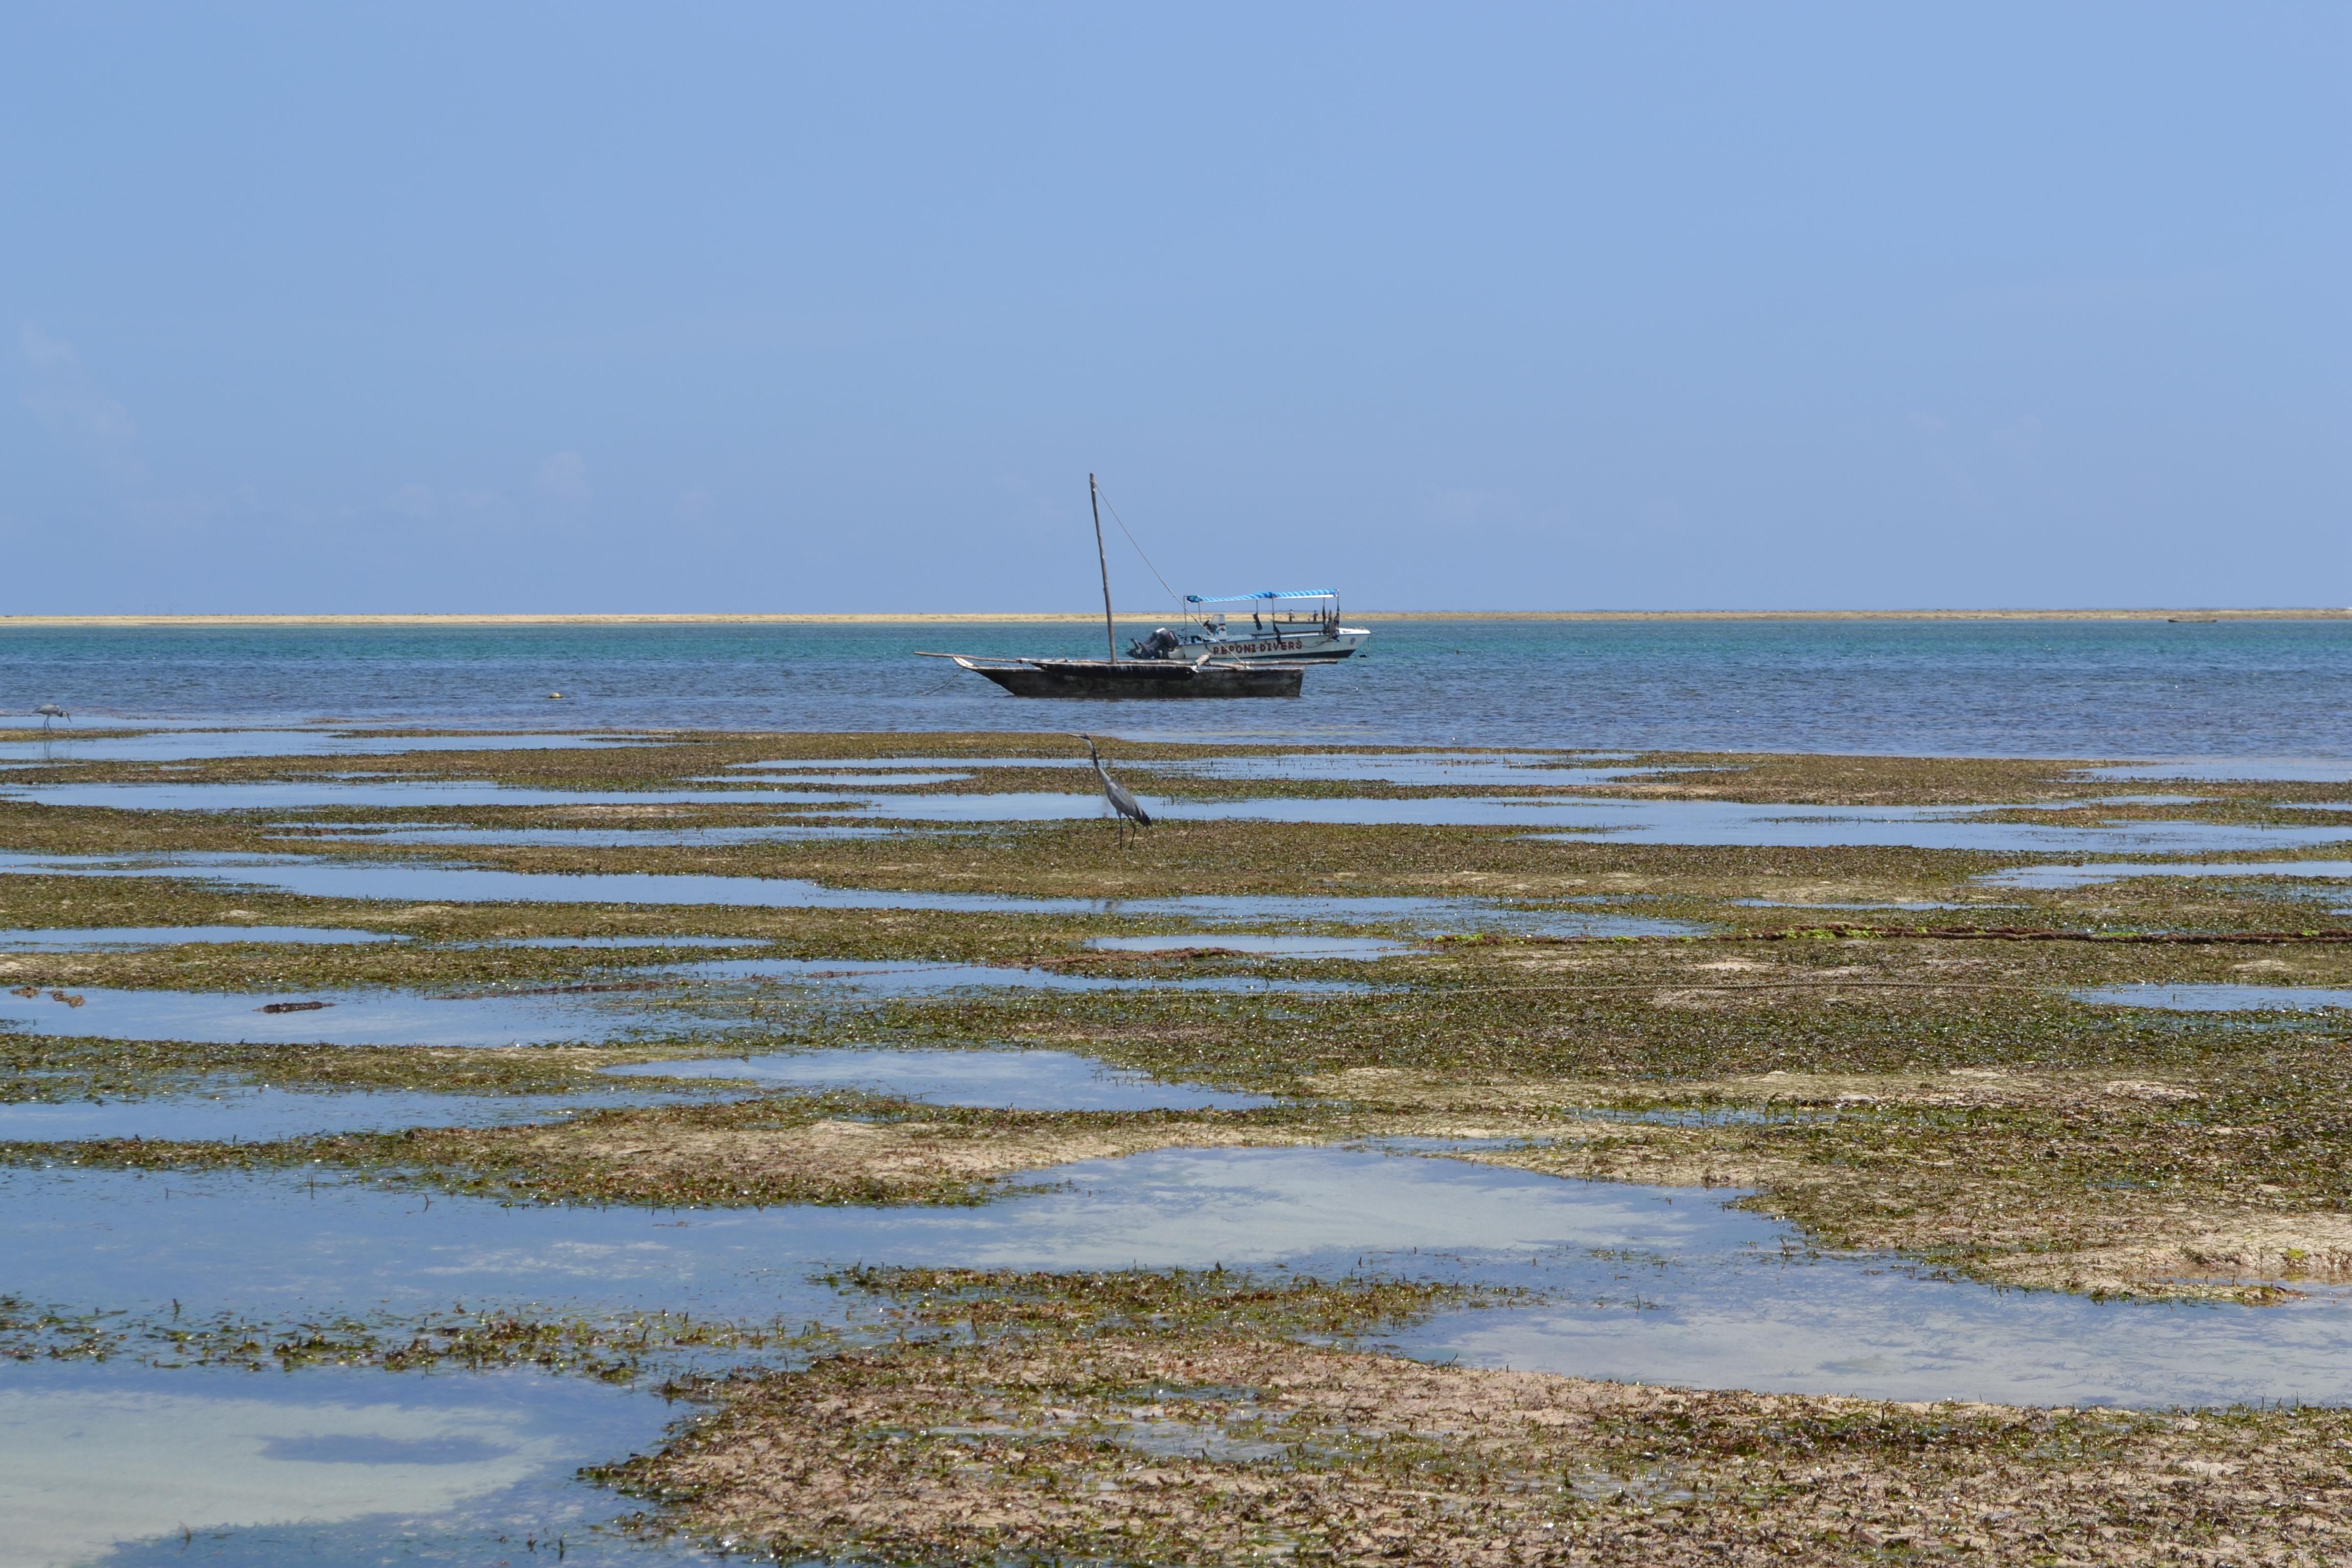 Low Tide For Bay Of Islands Nfld For Nov Th